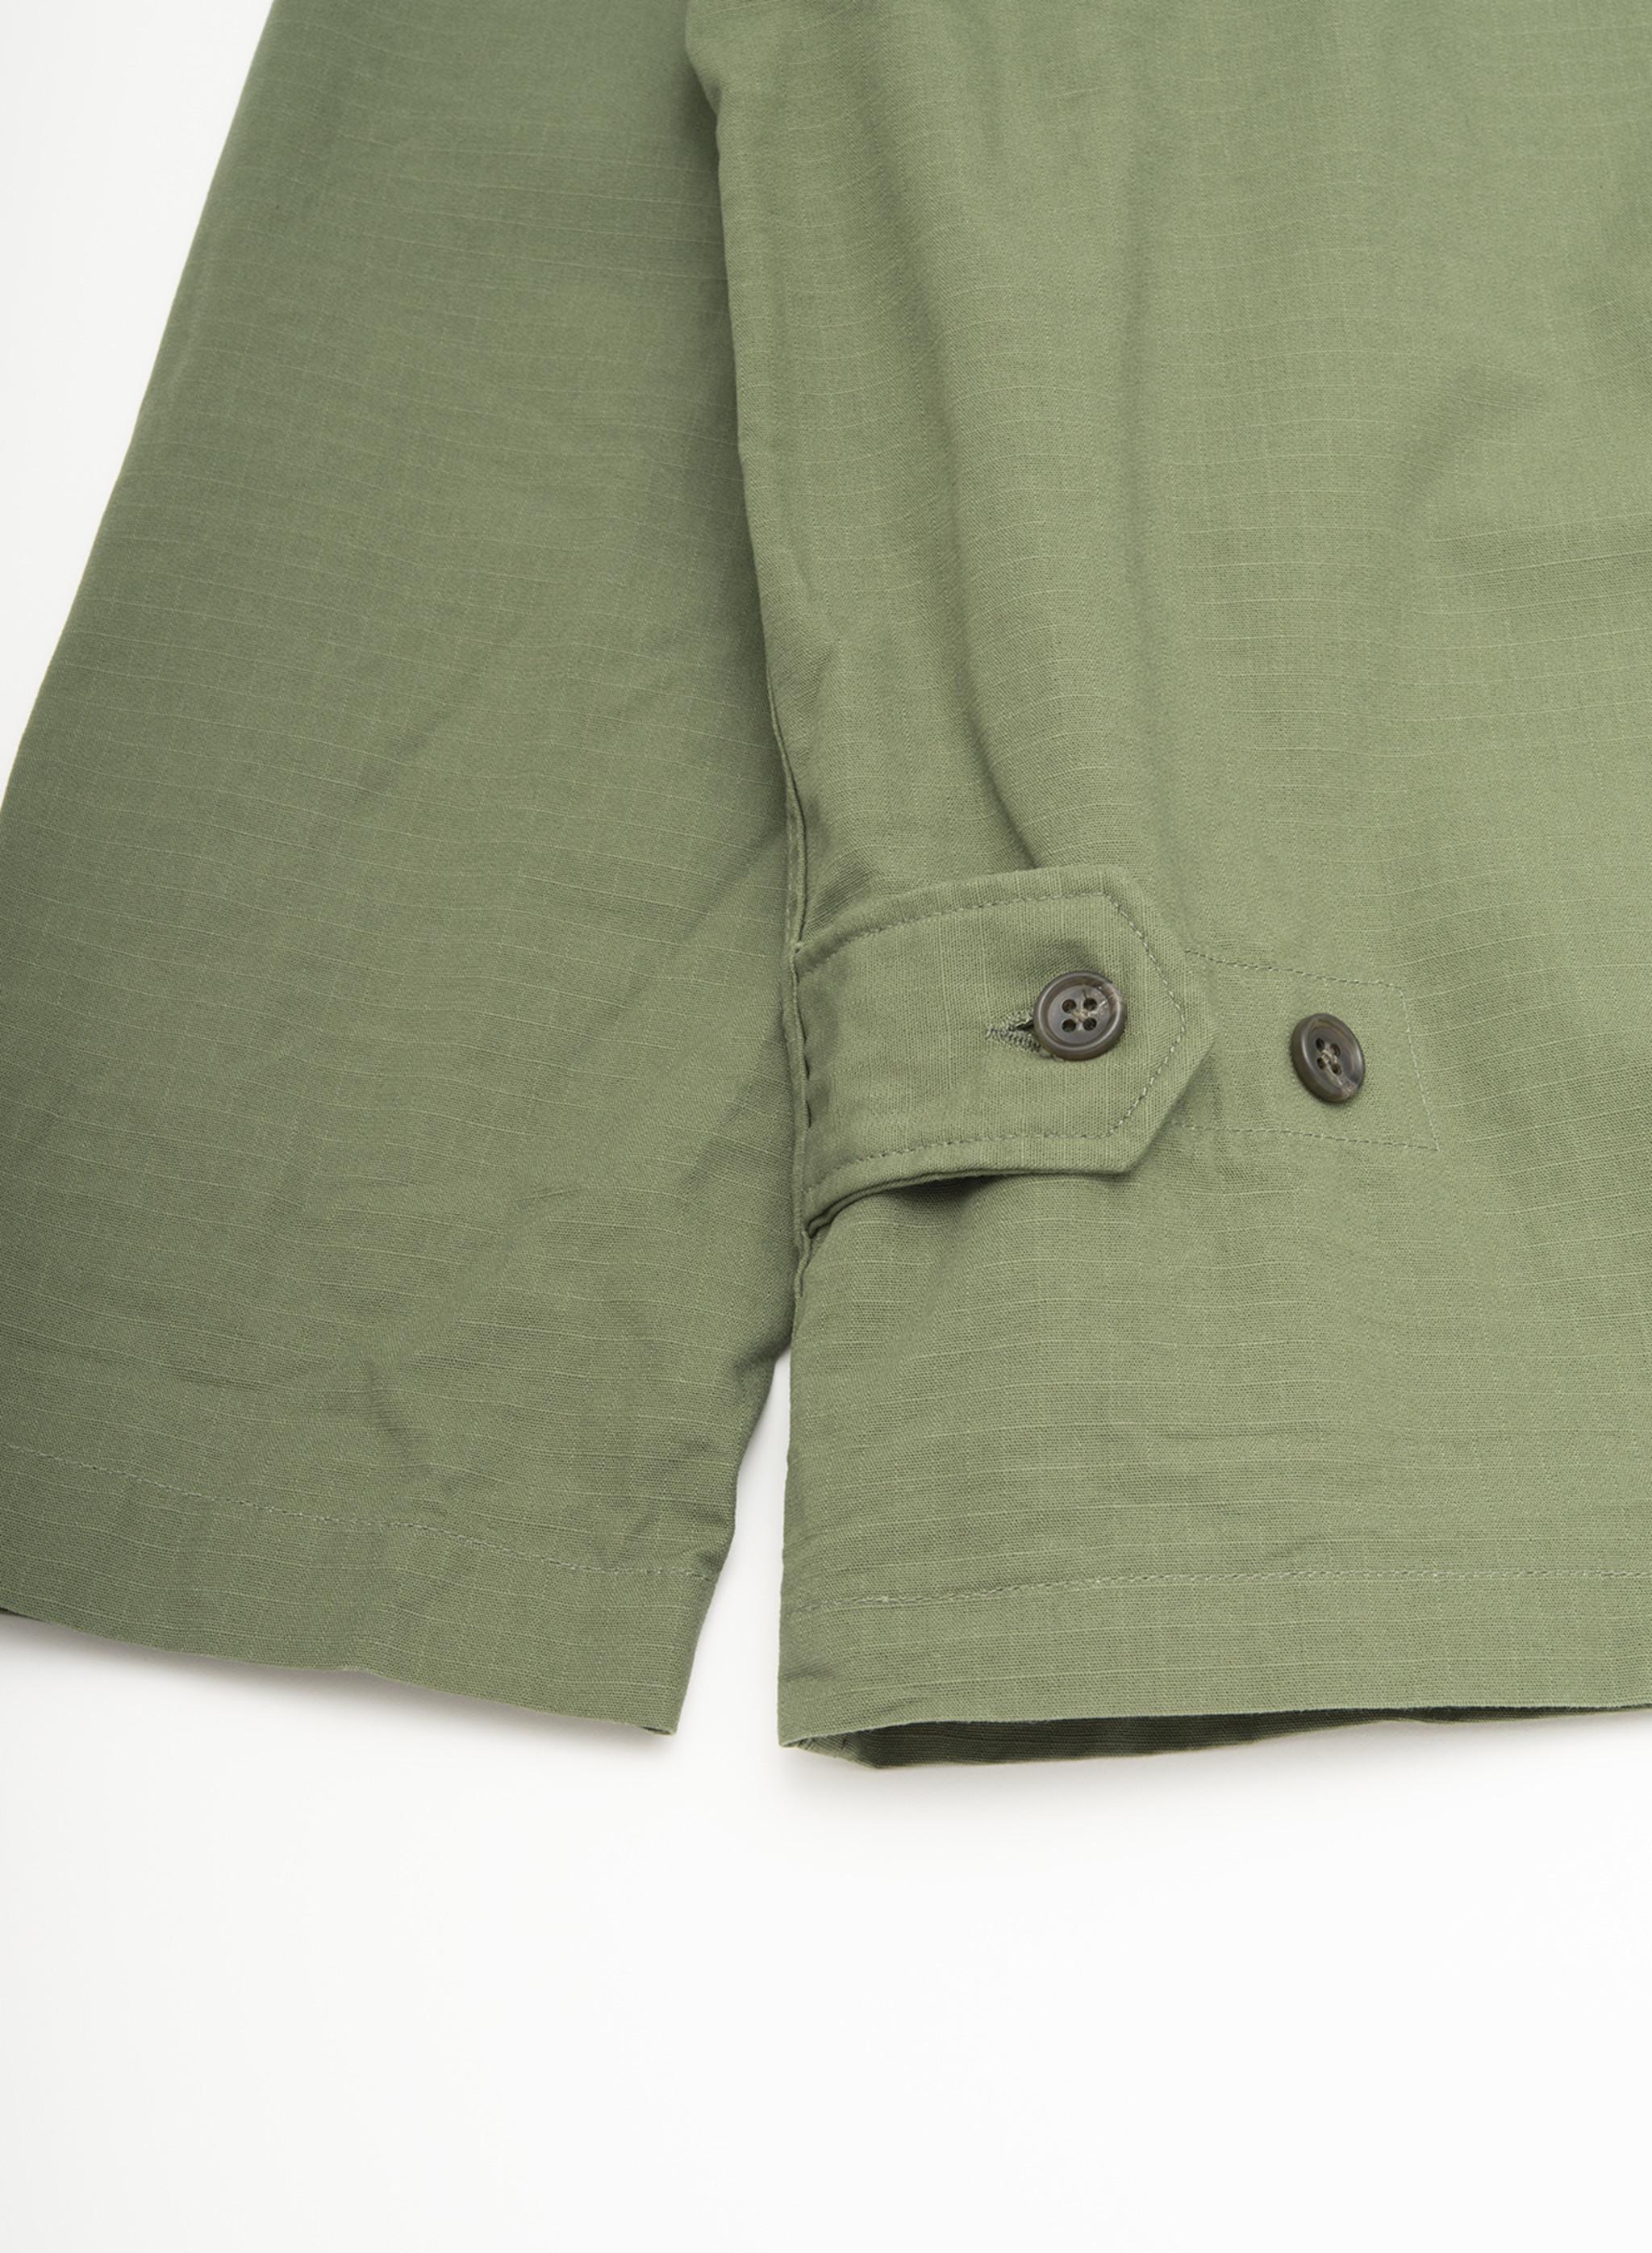 Engineered Garments Cardigan Jacket - Olive Cotton Ripstop